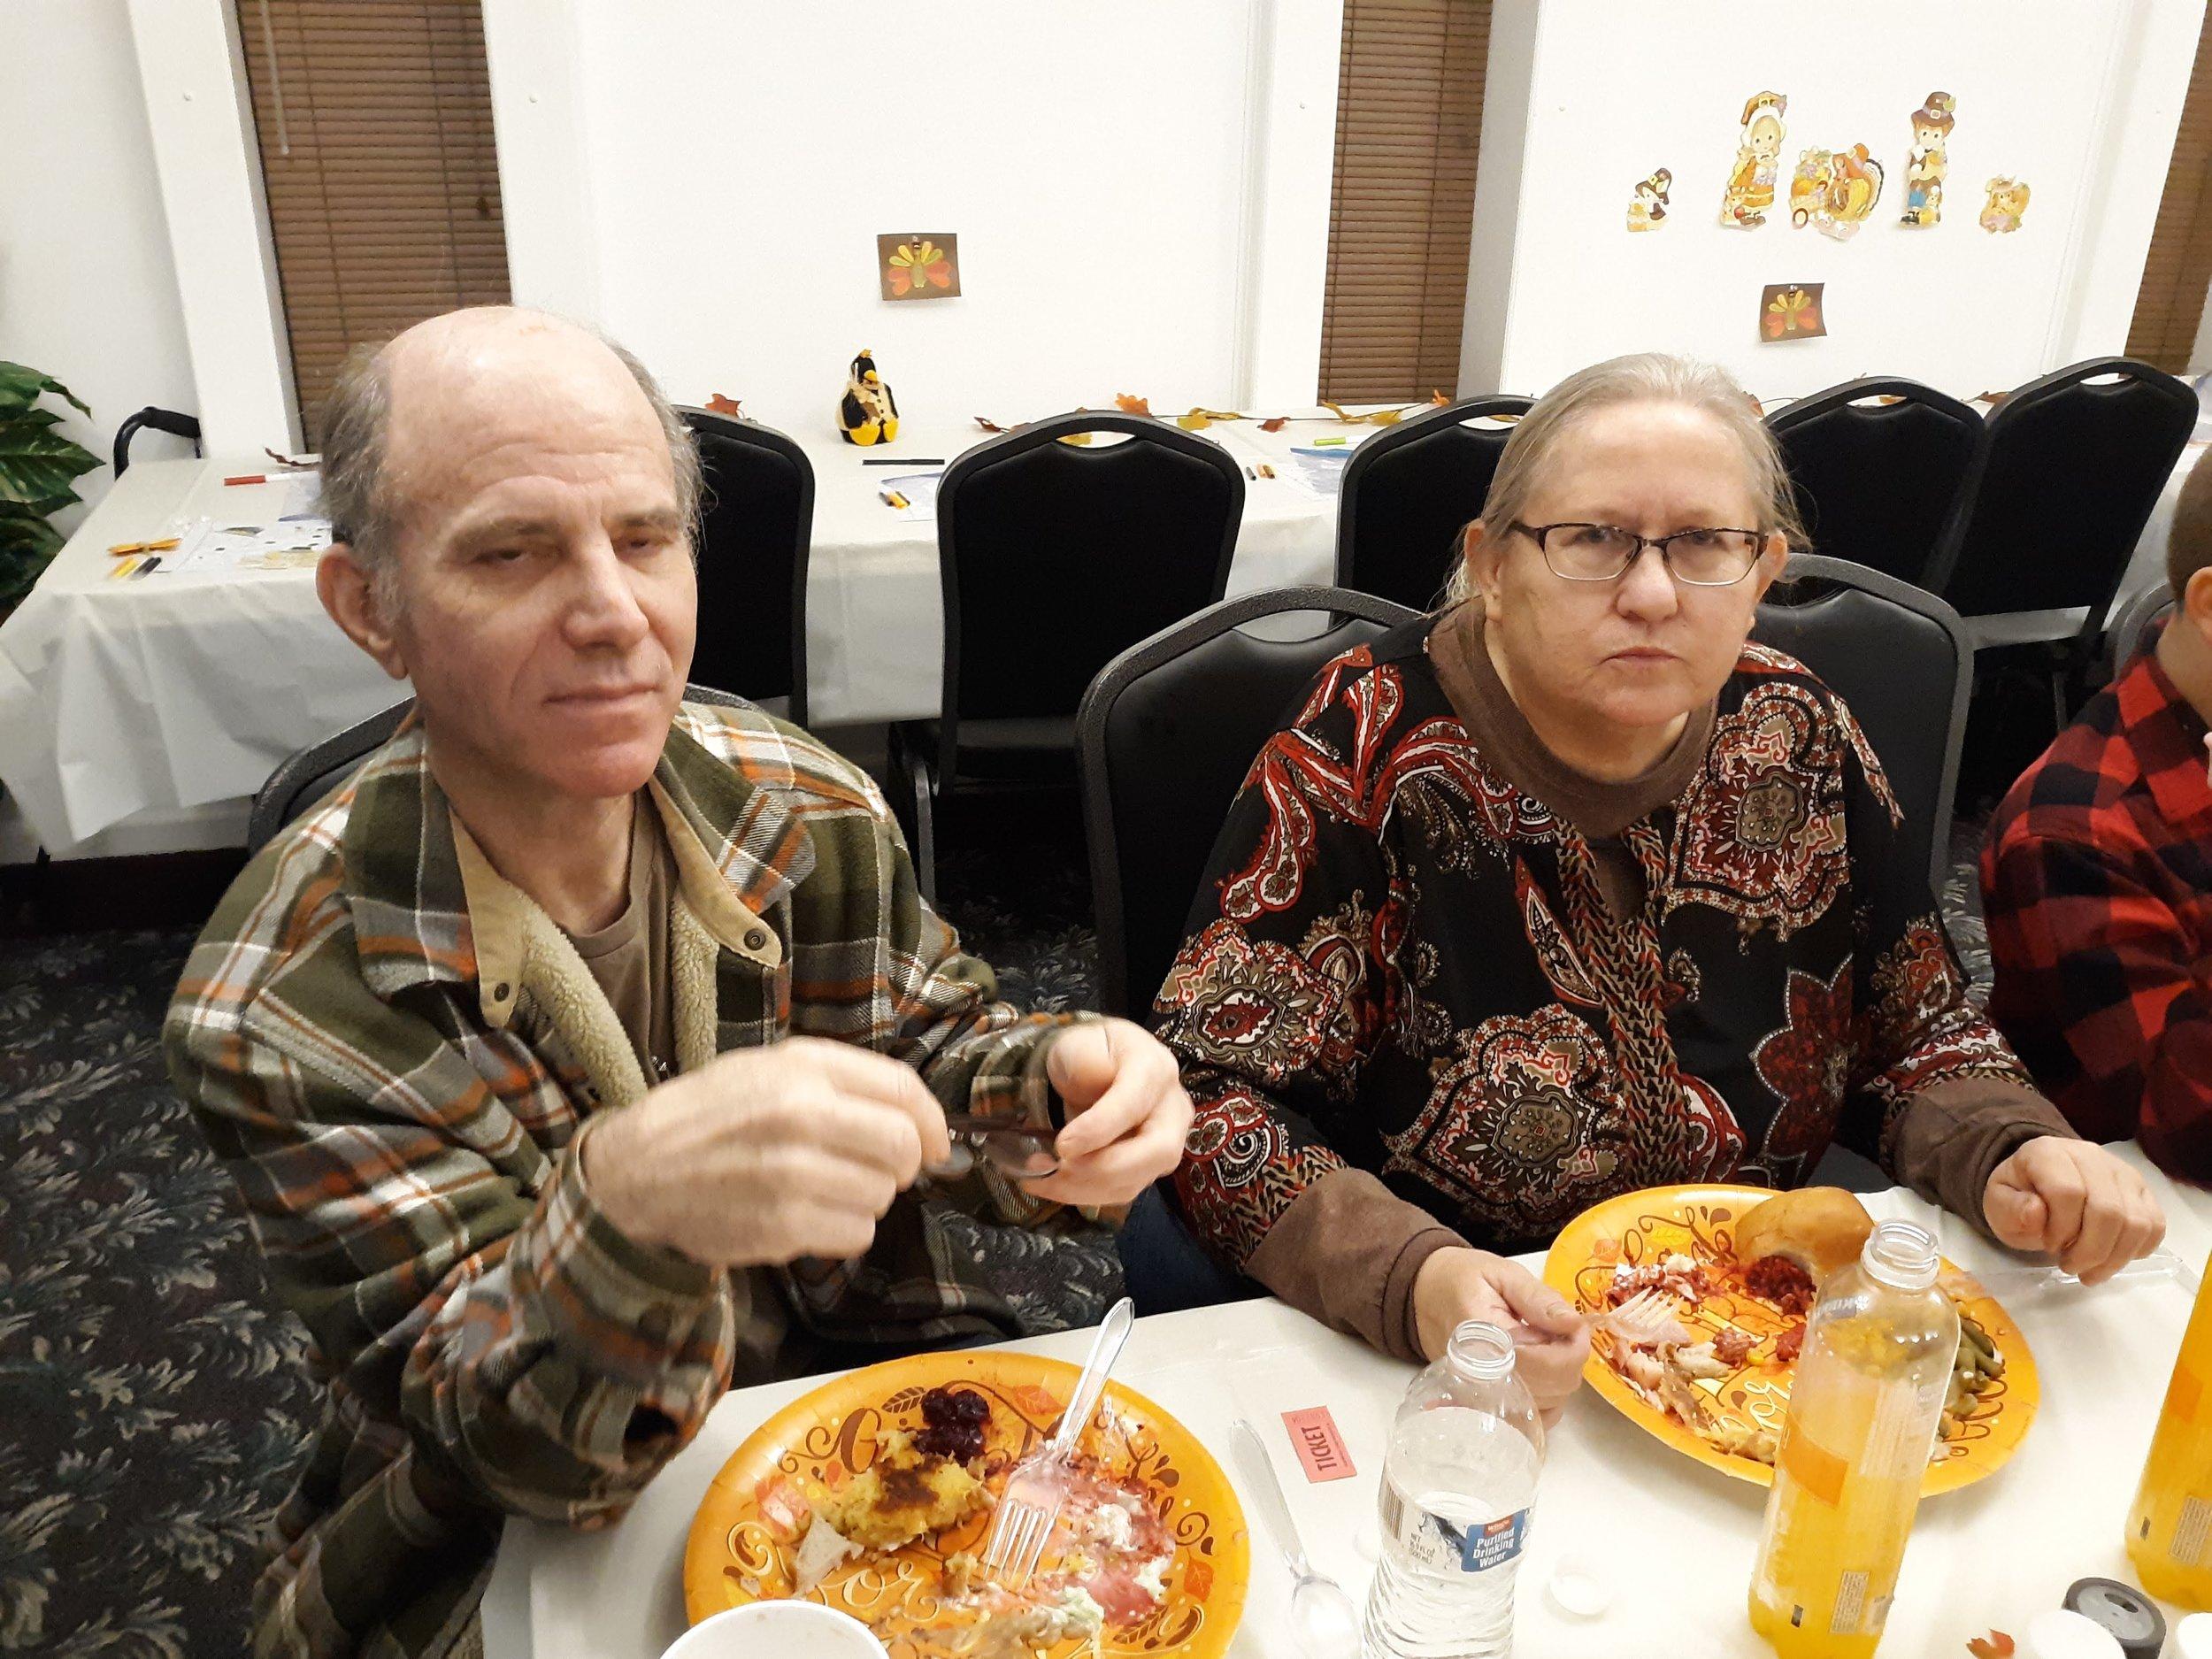 Bro. Jeff and Sis. Debbie Ann